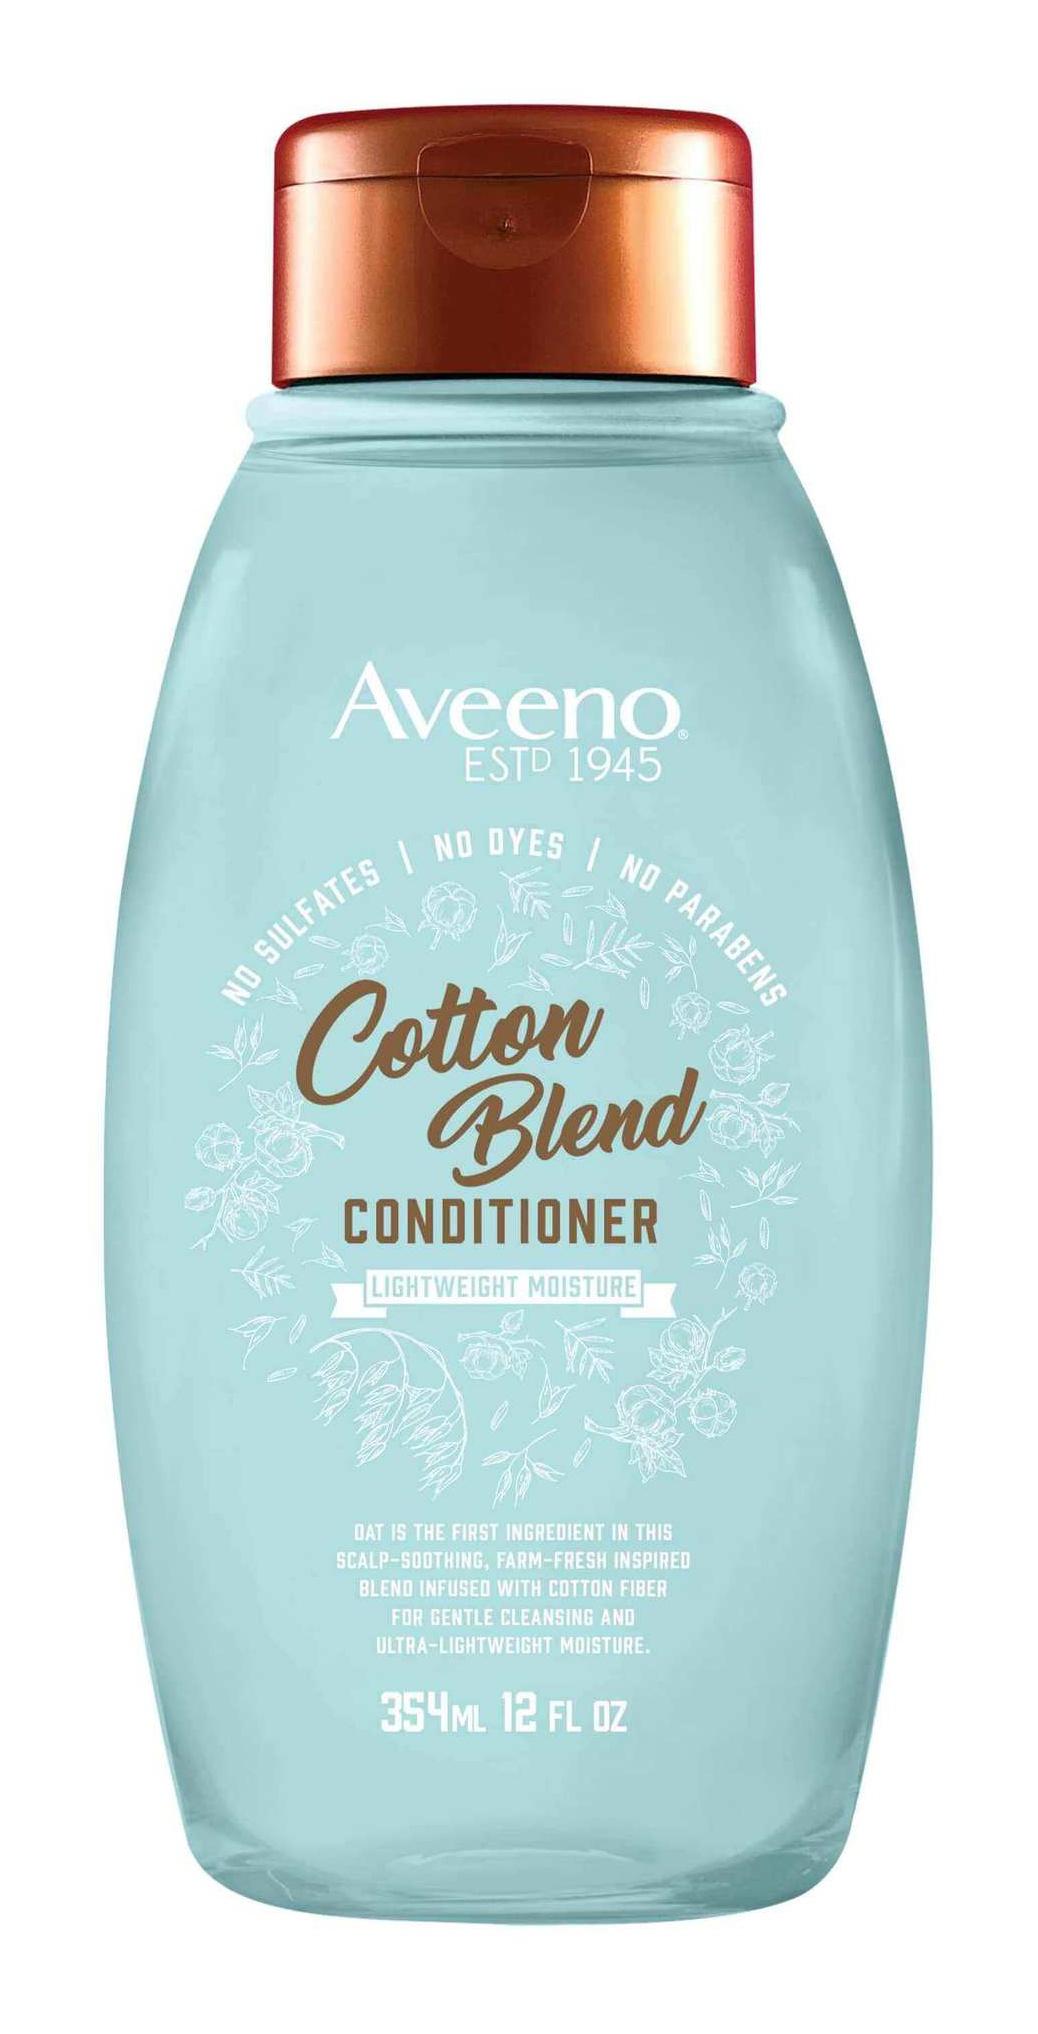 Aveeno Cotton Blend Conditioner